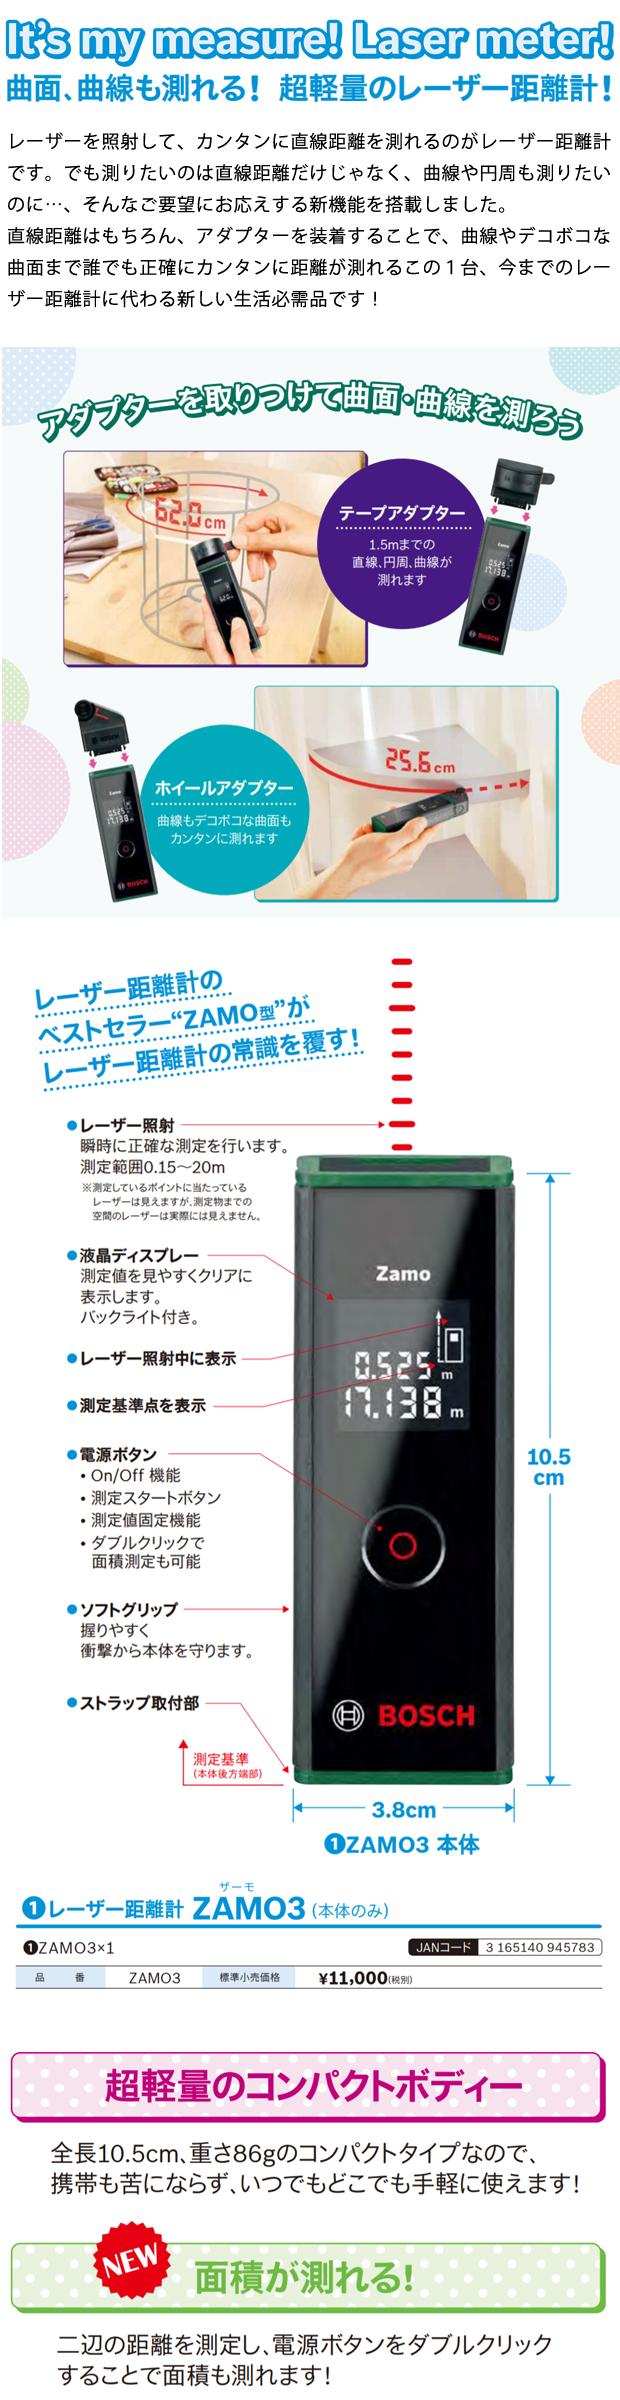 BOSCH レーザー距離計 ZAMO3